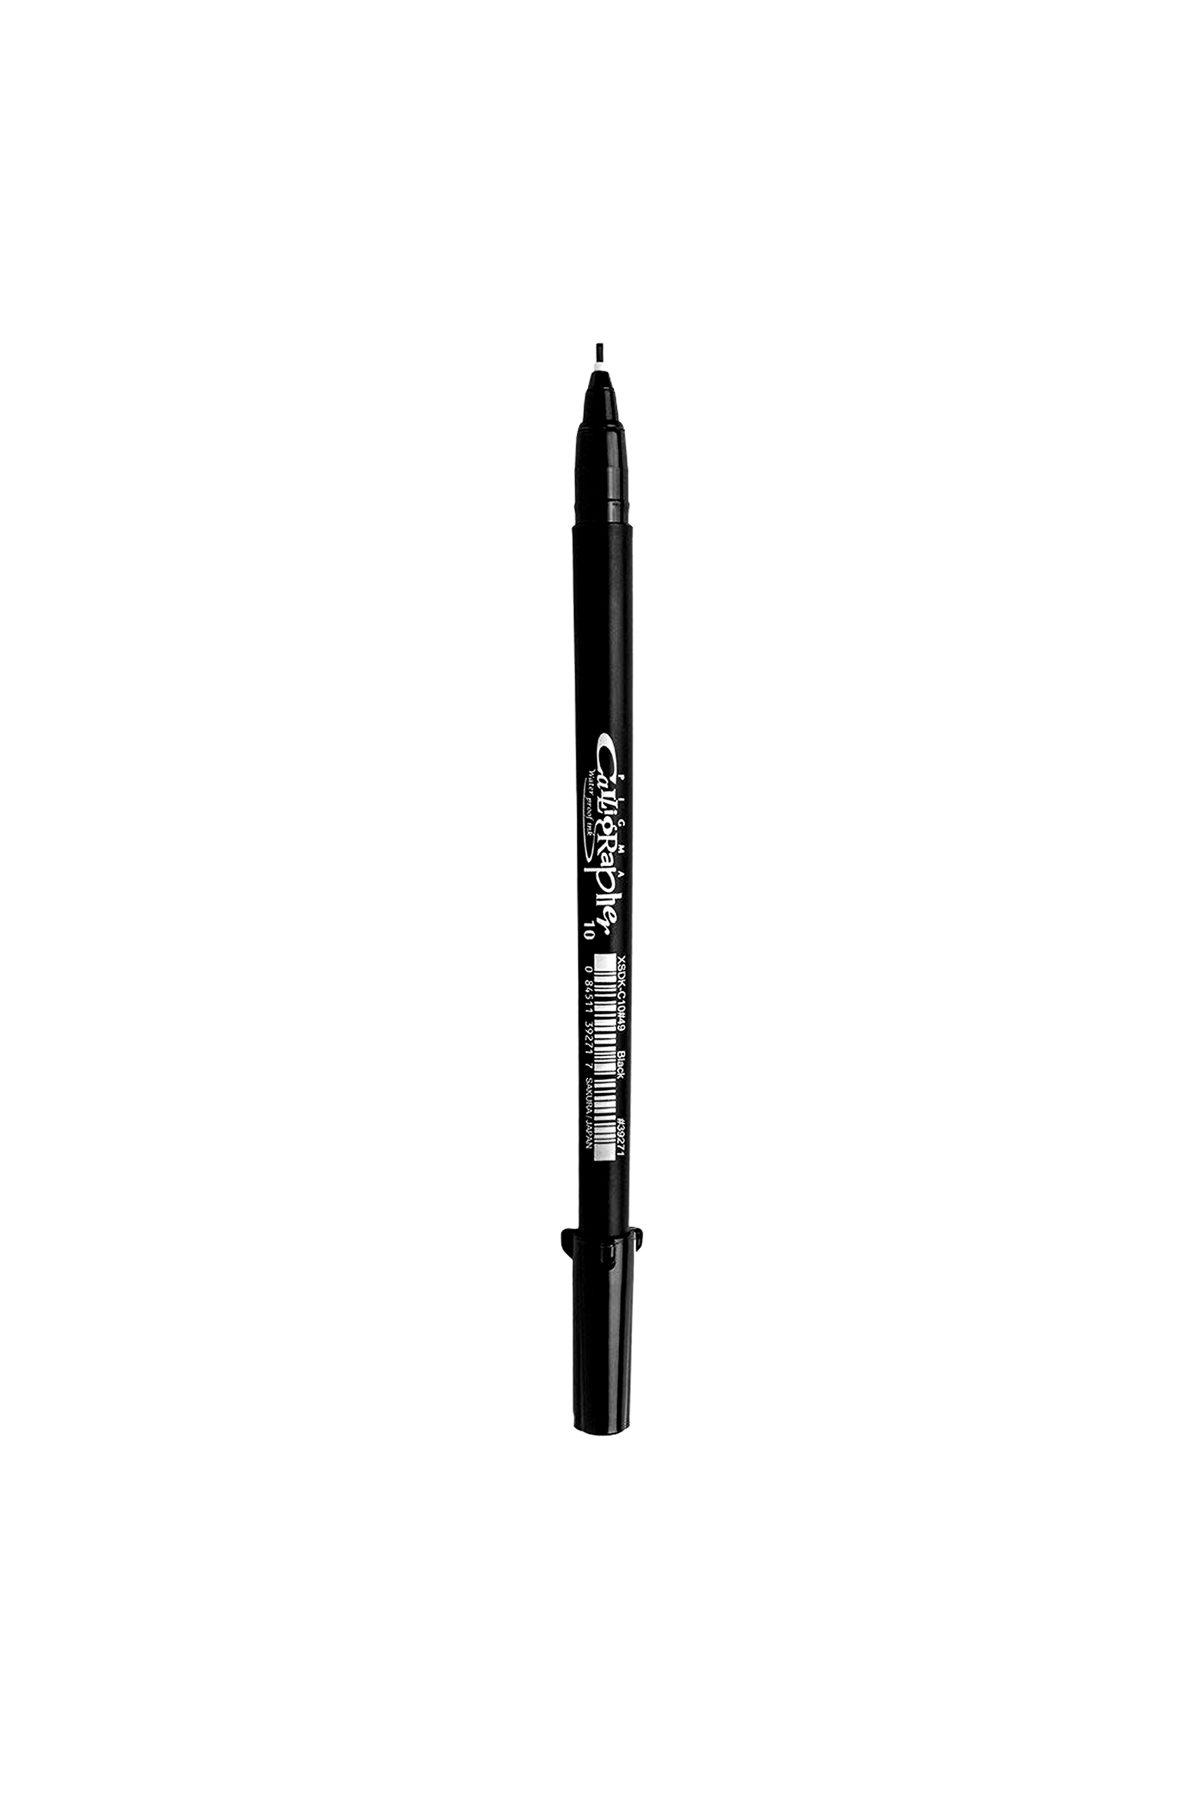 Sakura PIGMA CALLIGRAPHER Pen 10